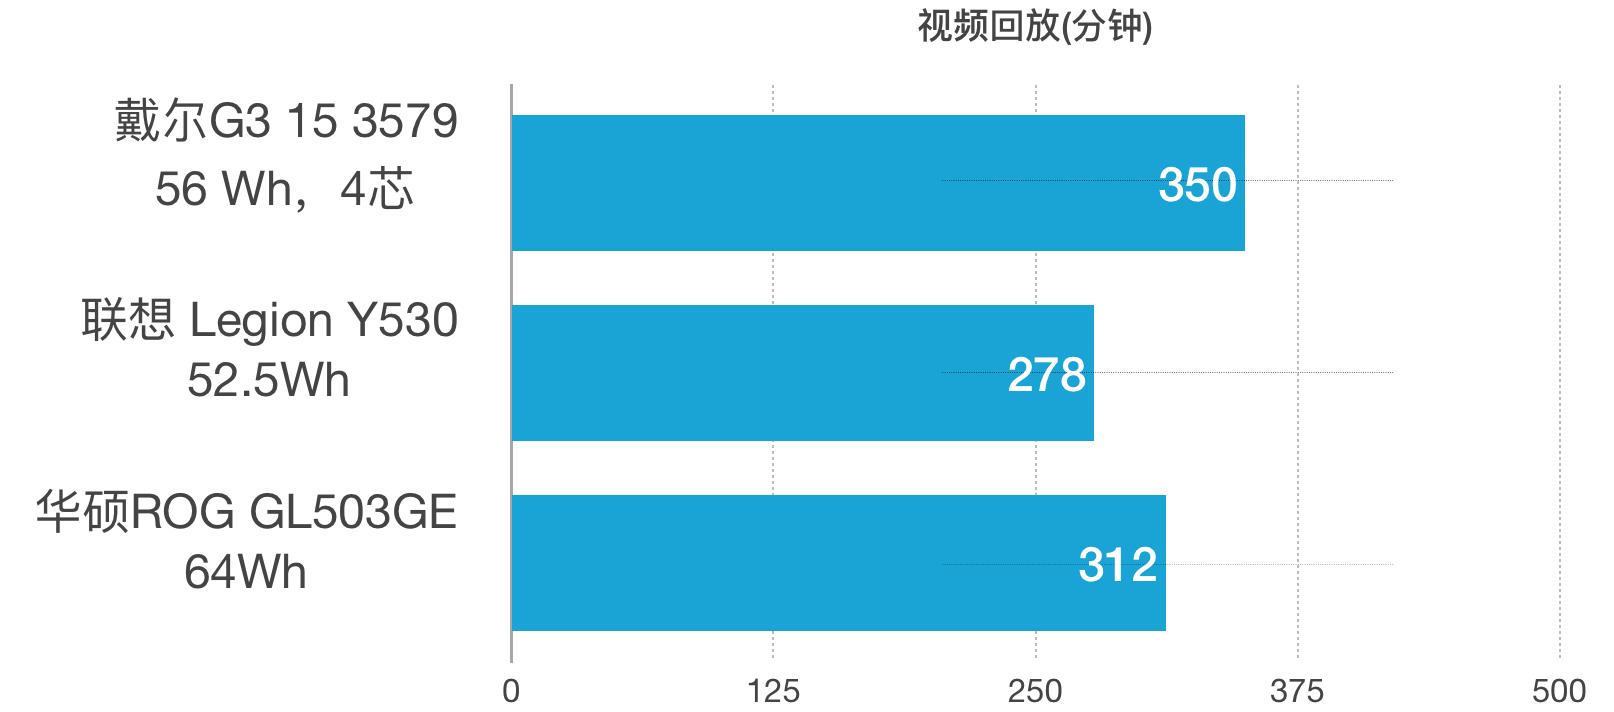 Dell 戴尔 G3 15 3579 评测